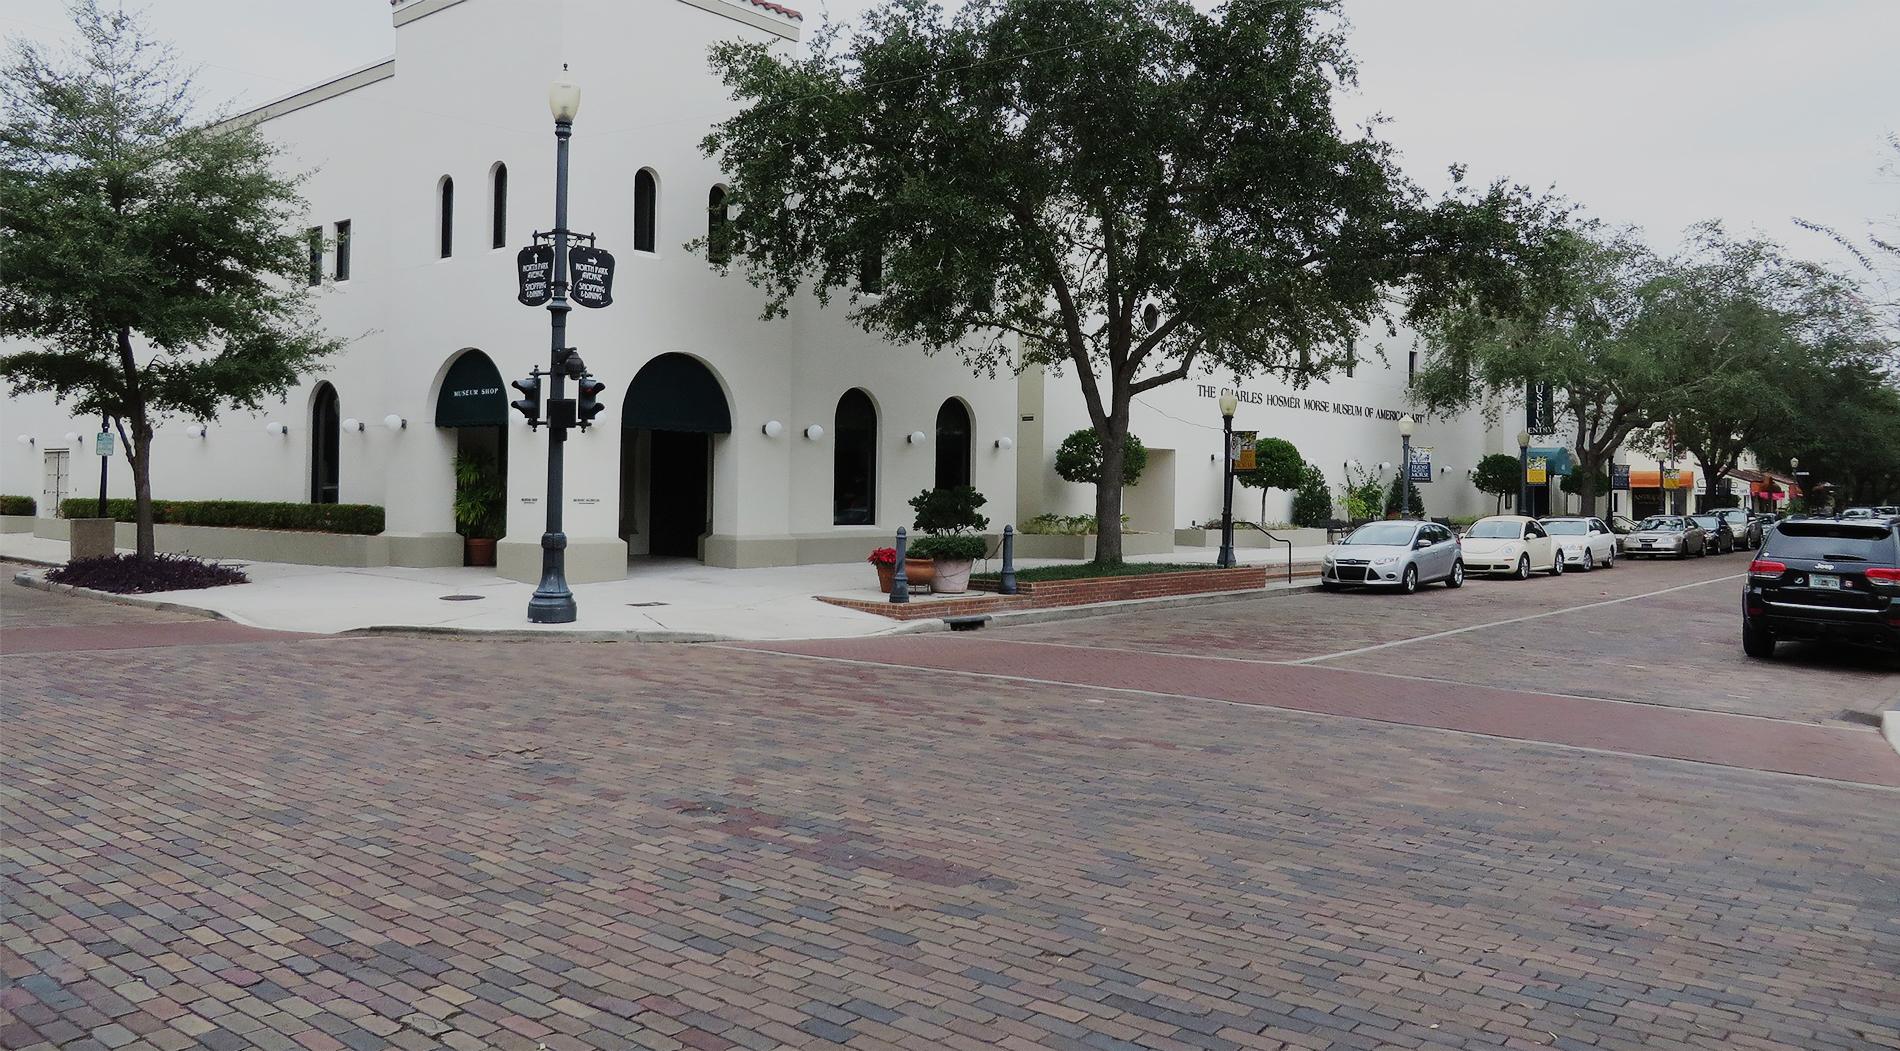 Charles_Hosmer_Morse_Museum_of_American_Art_(Winter_Park,_Florida)